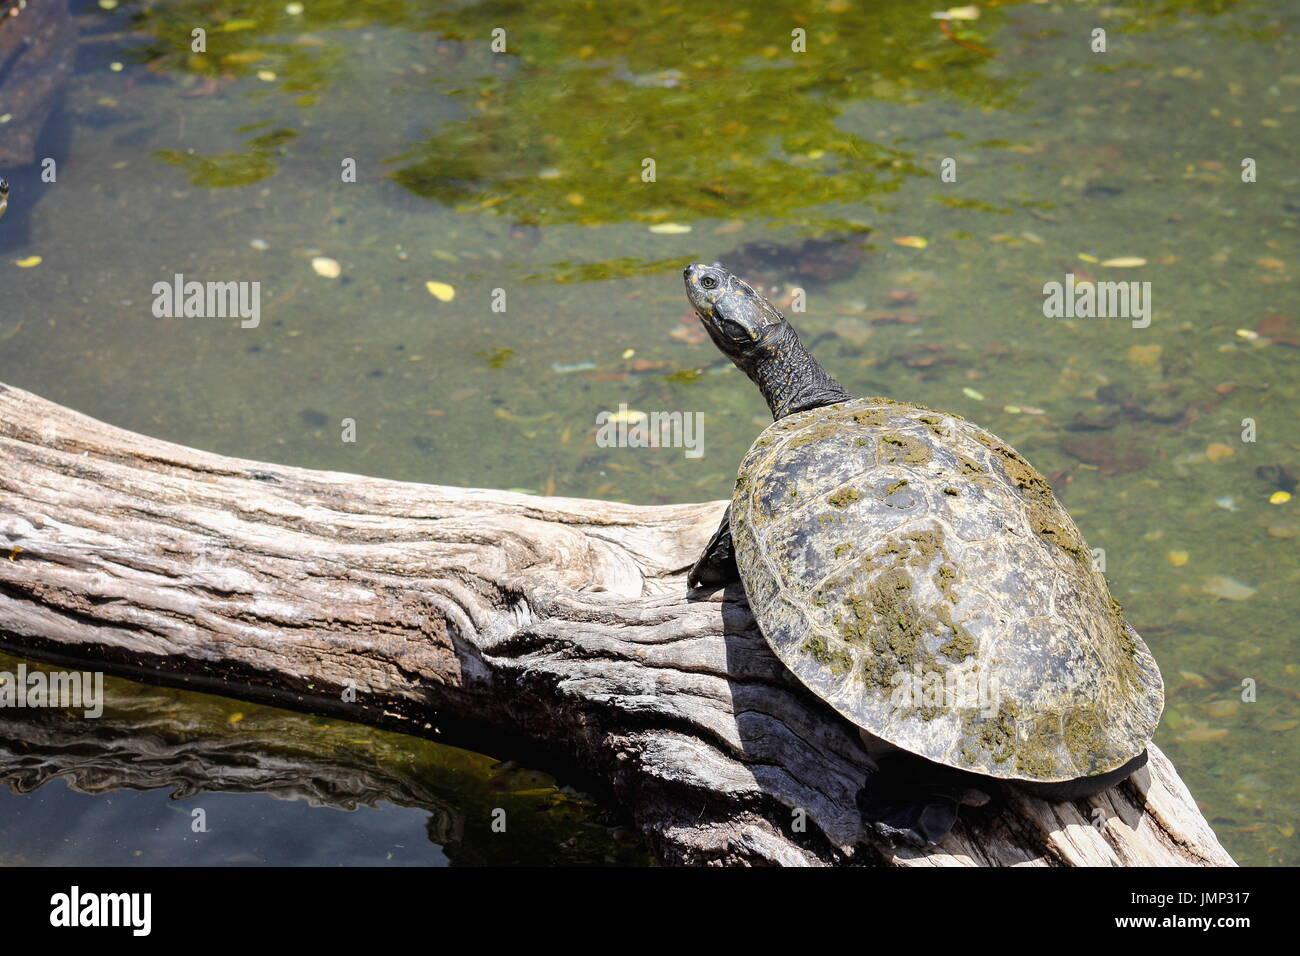 Manchas amarillas Podocnemis unifilis tortuga Amazónica - Imagen De Stock